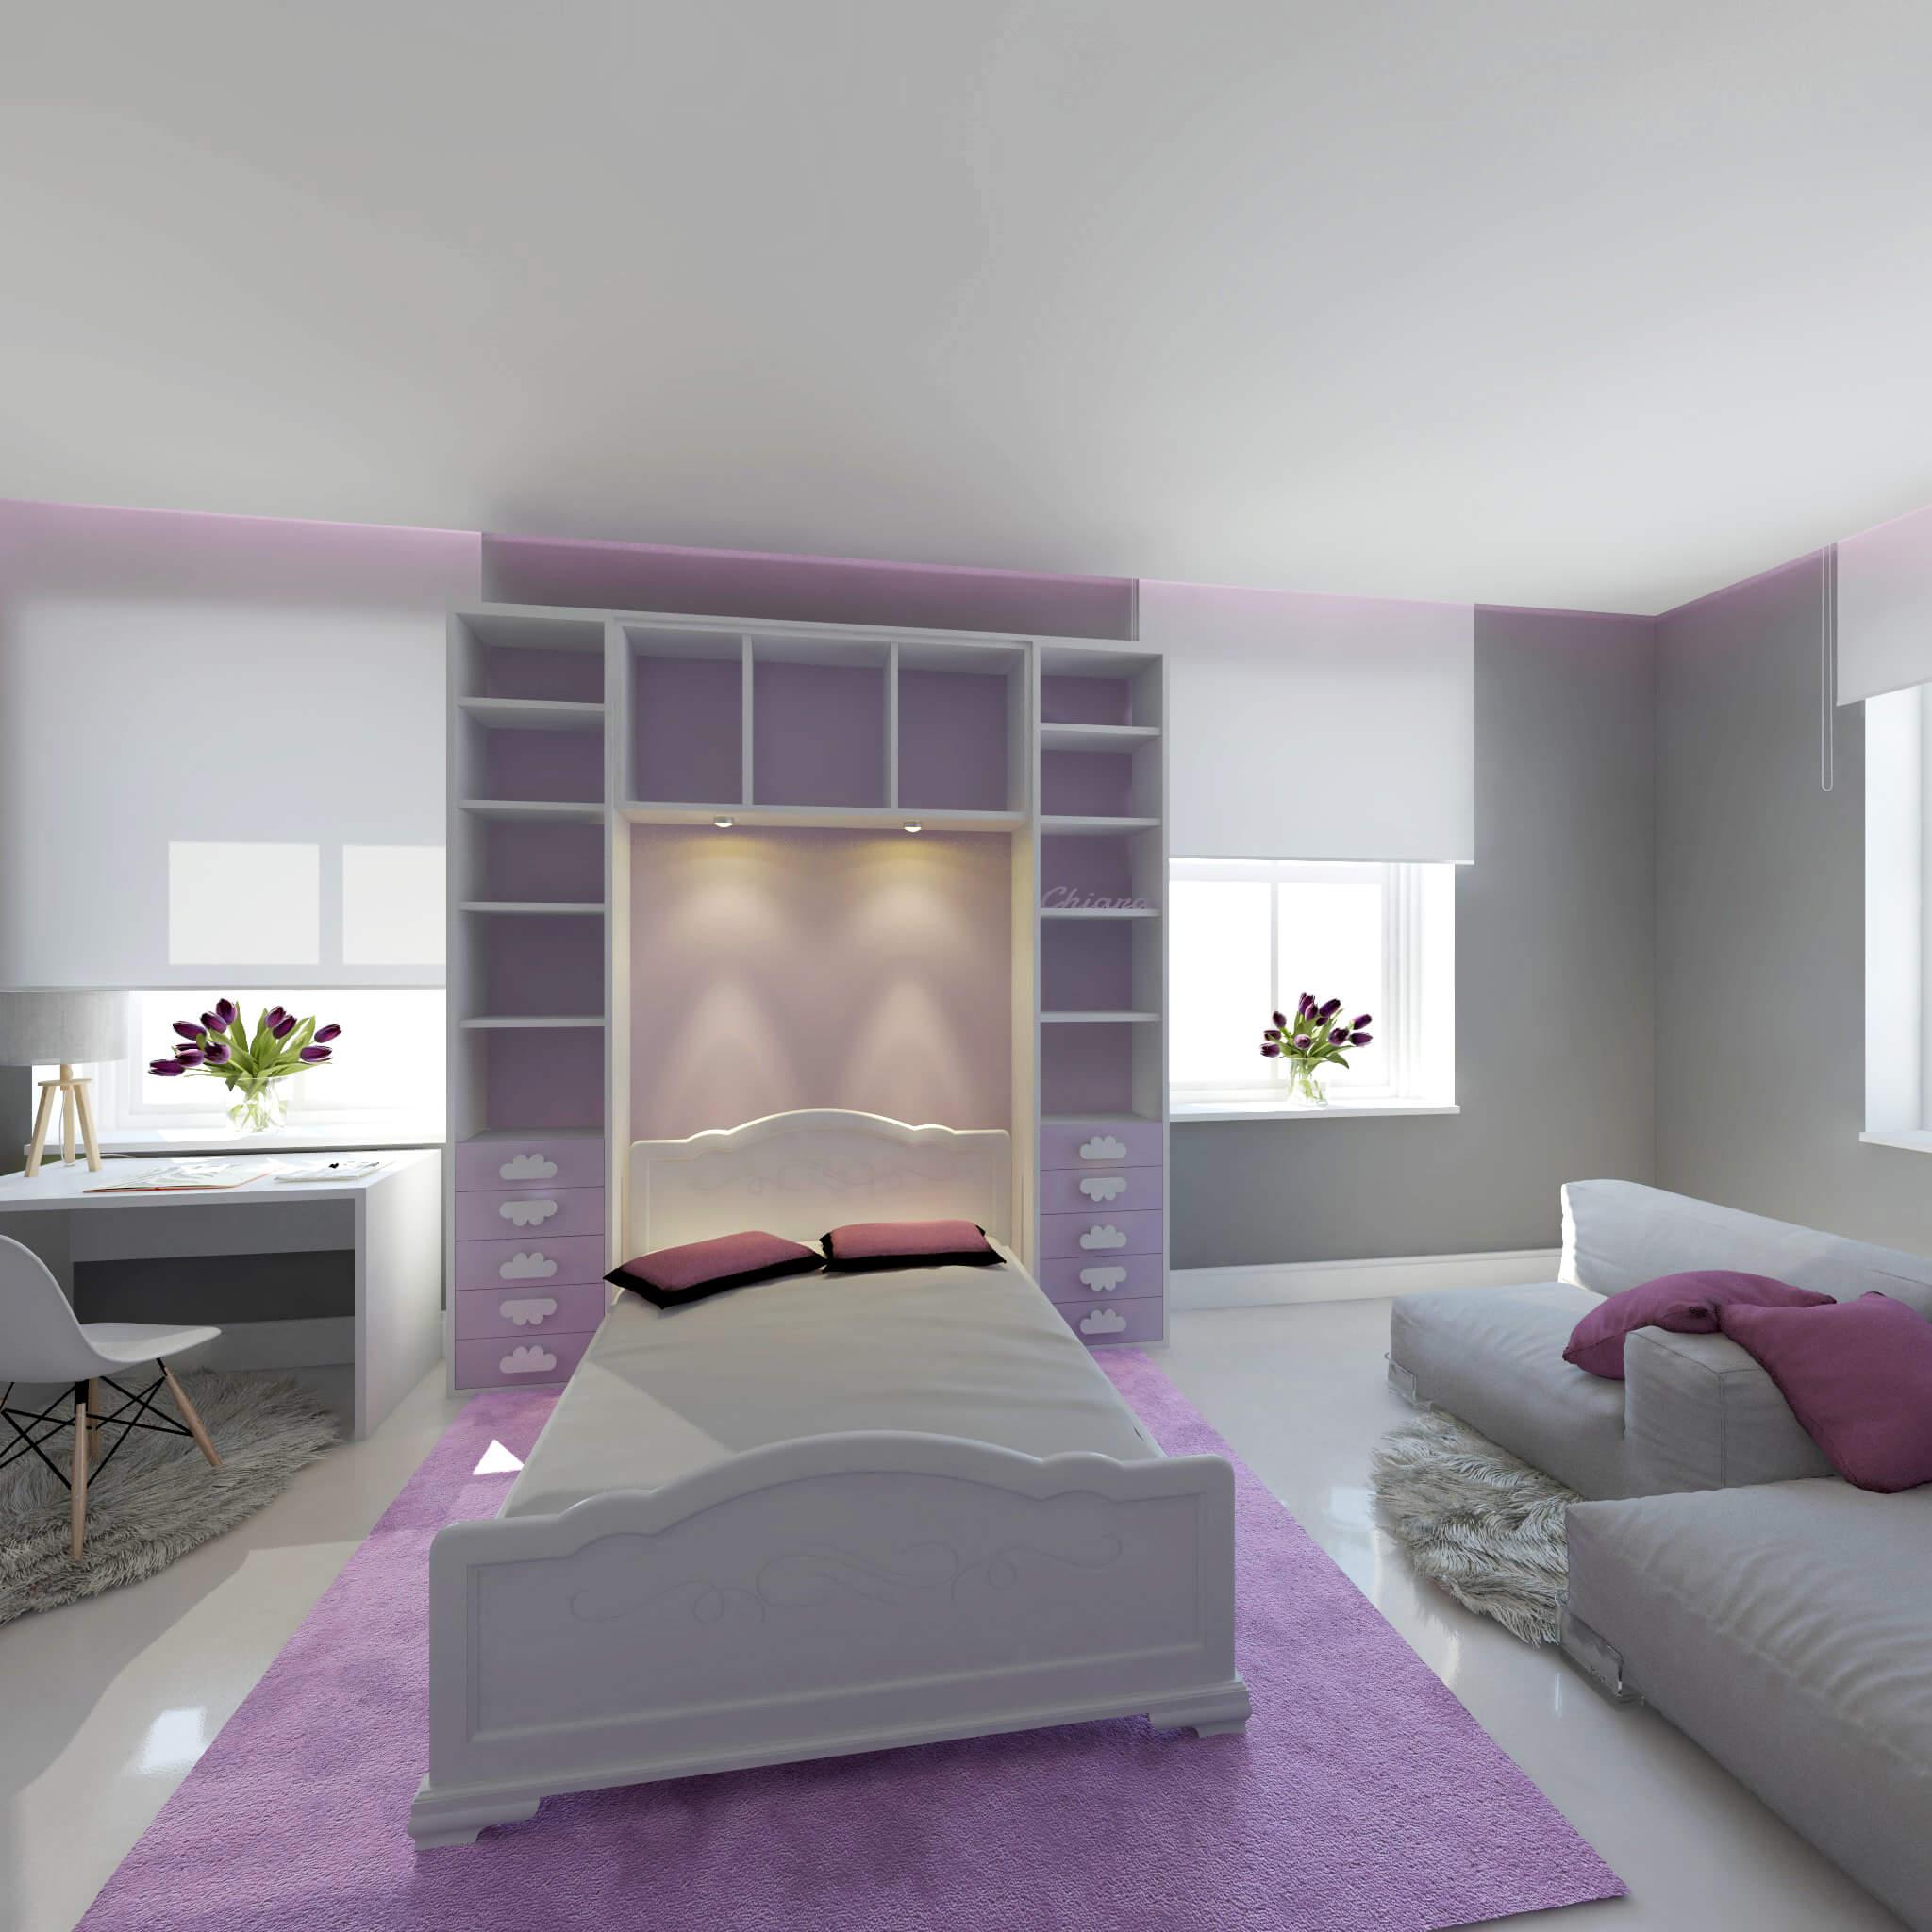 jugendzimmer design by torsten muller aus bad honnef nahe koln bonn verkauf beratung planung interior designer